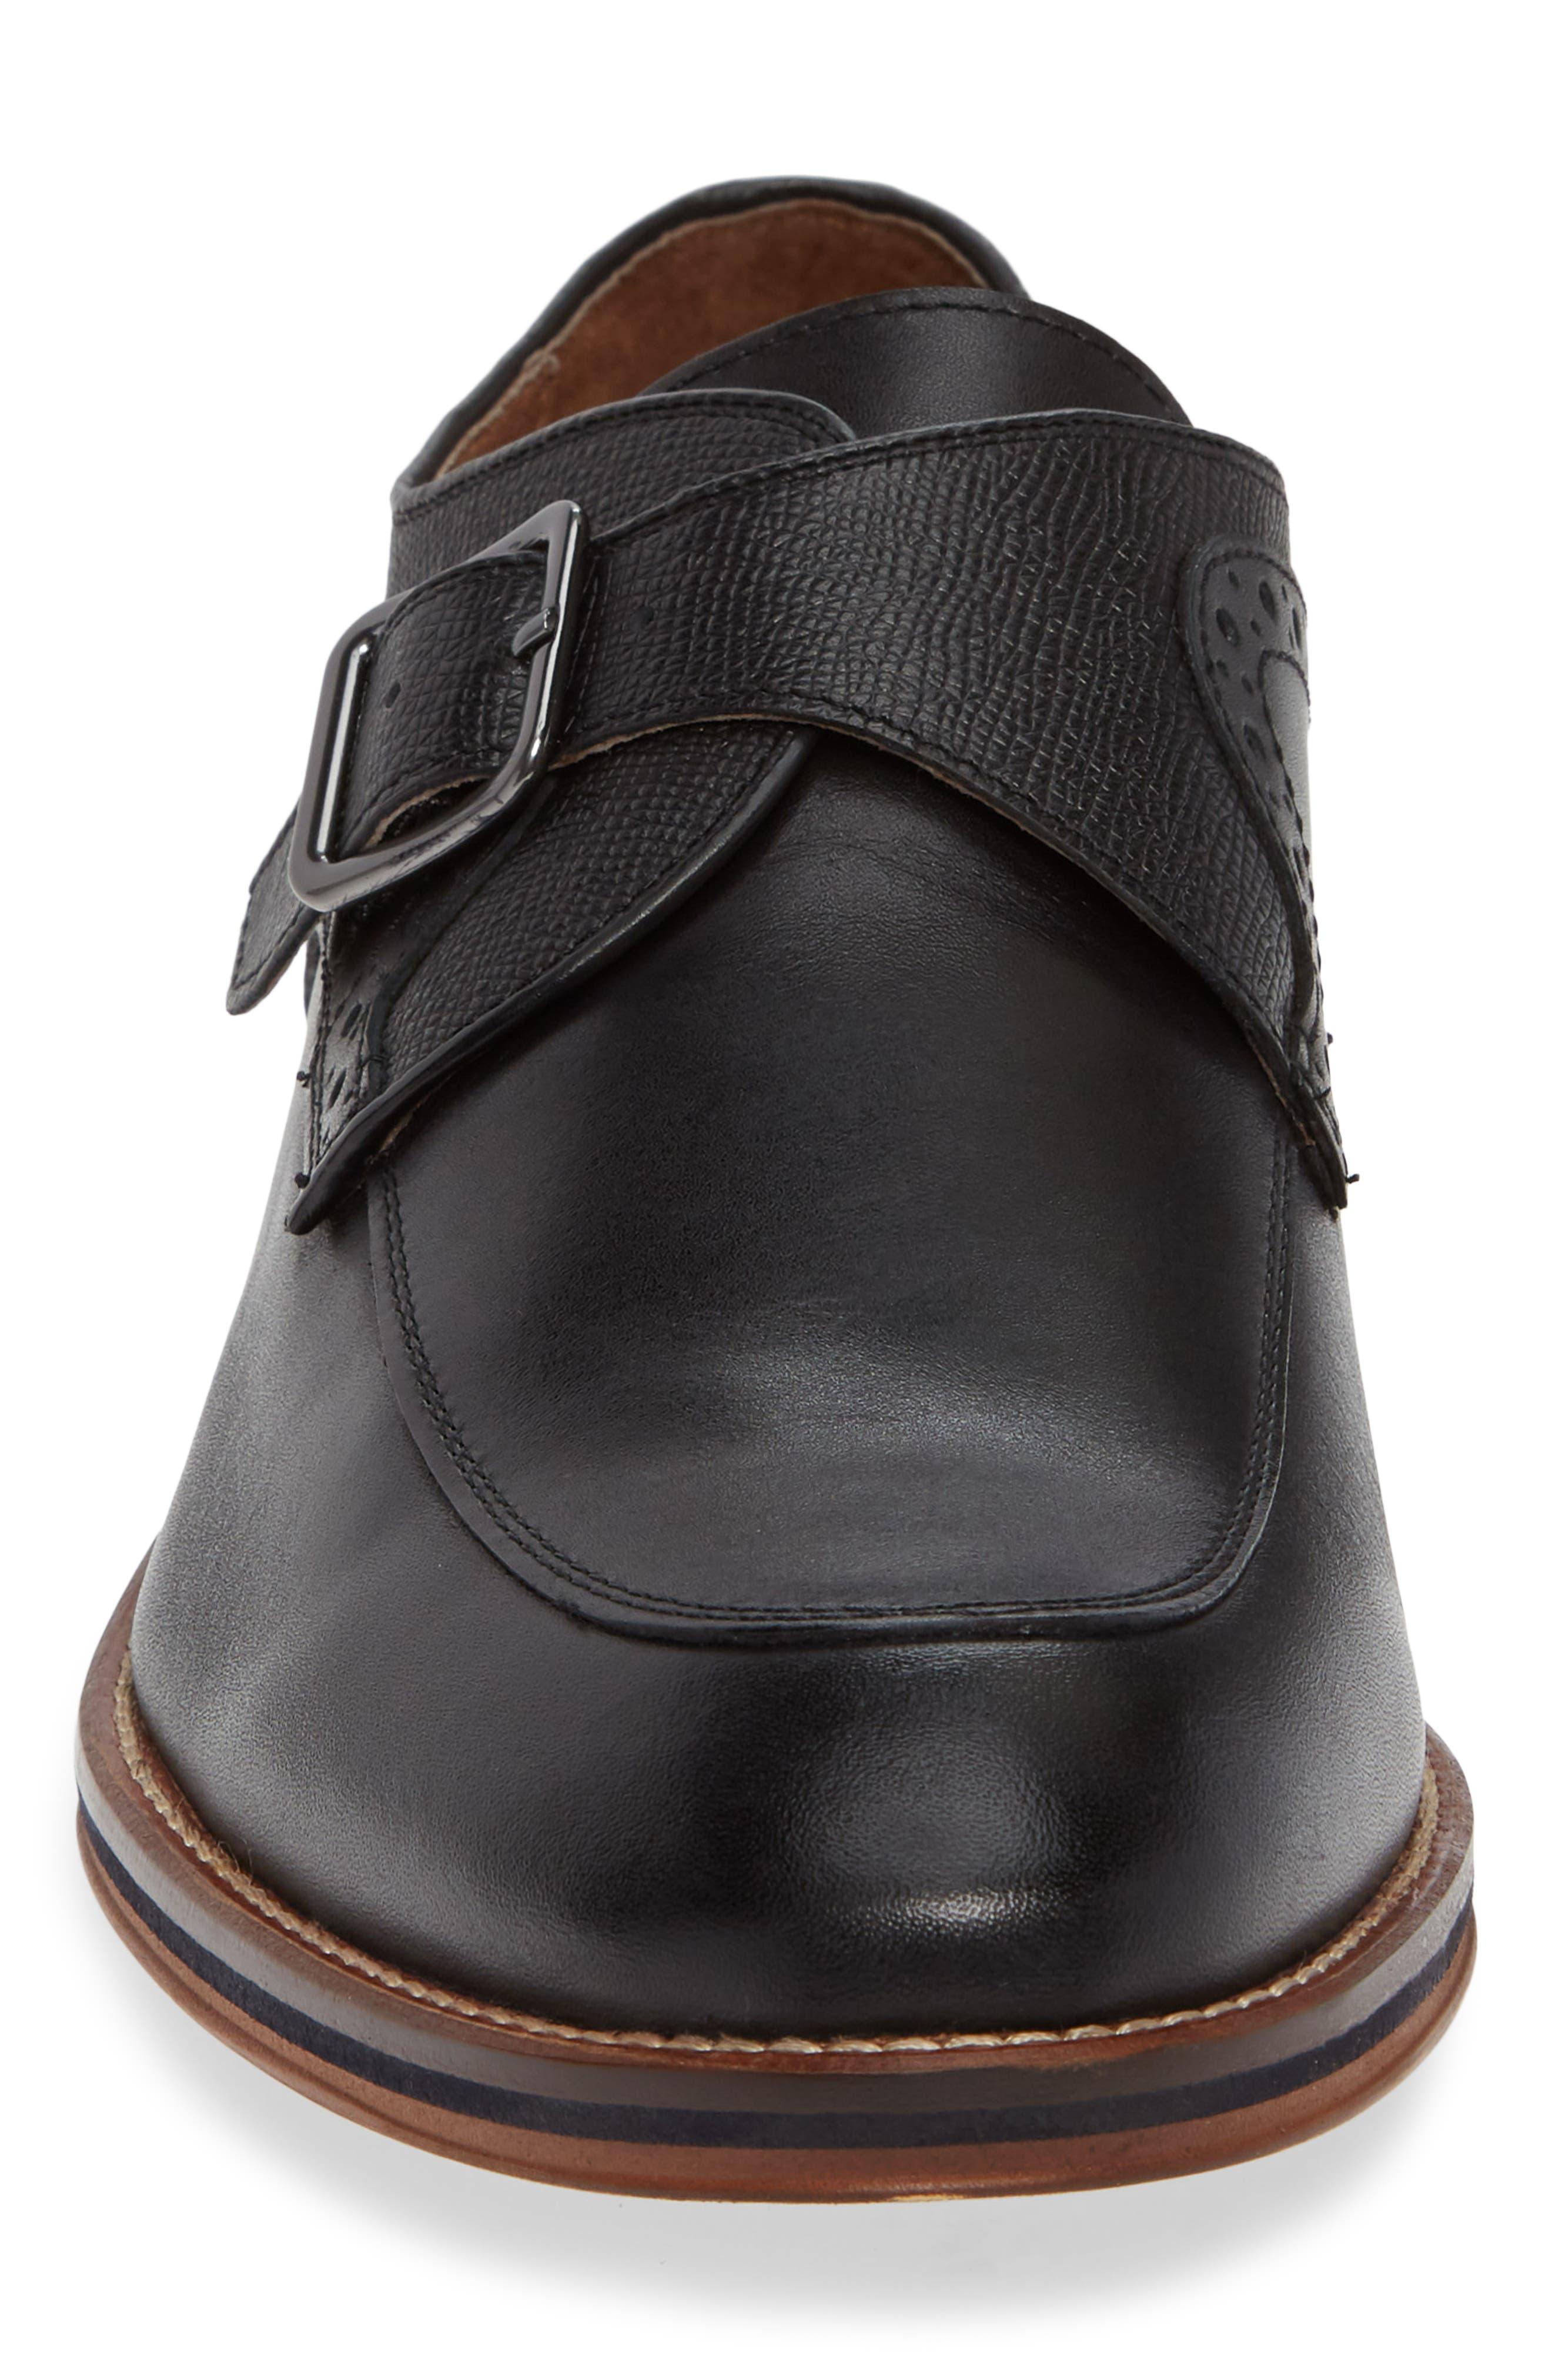 JOHNSTON & MURPHY, Conard Monk Strap Shoe, Alternate thumbnail 4, color, BLACK LEATHER